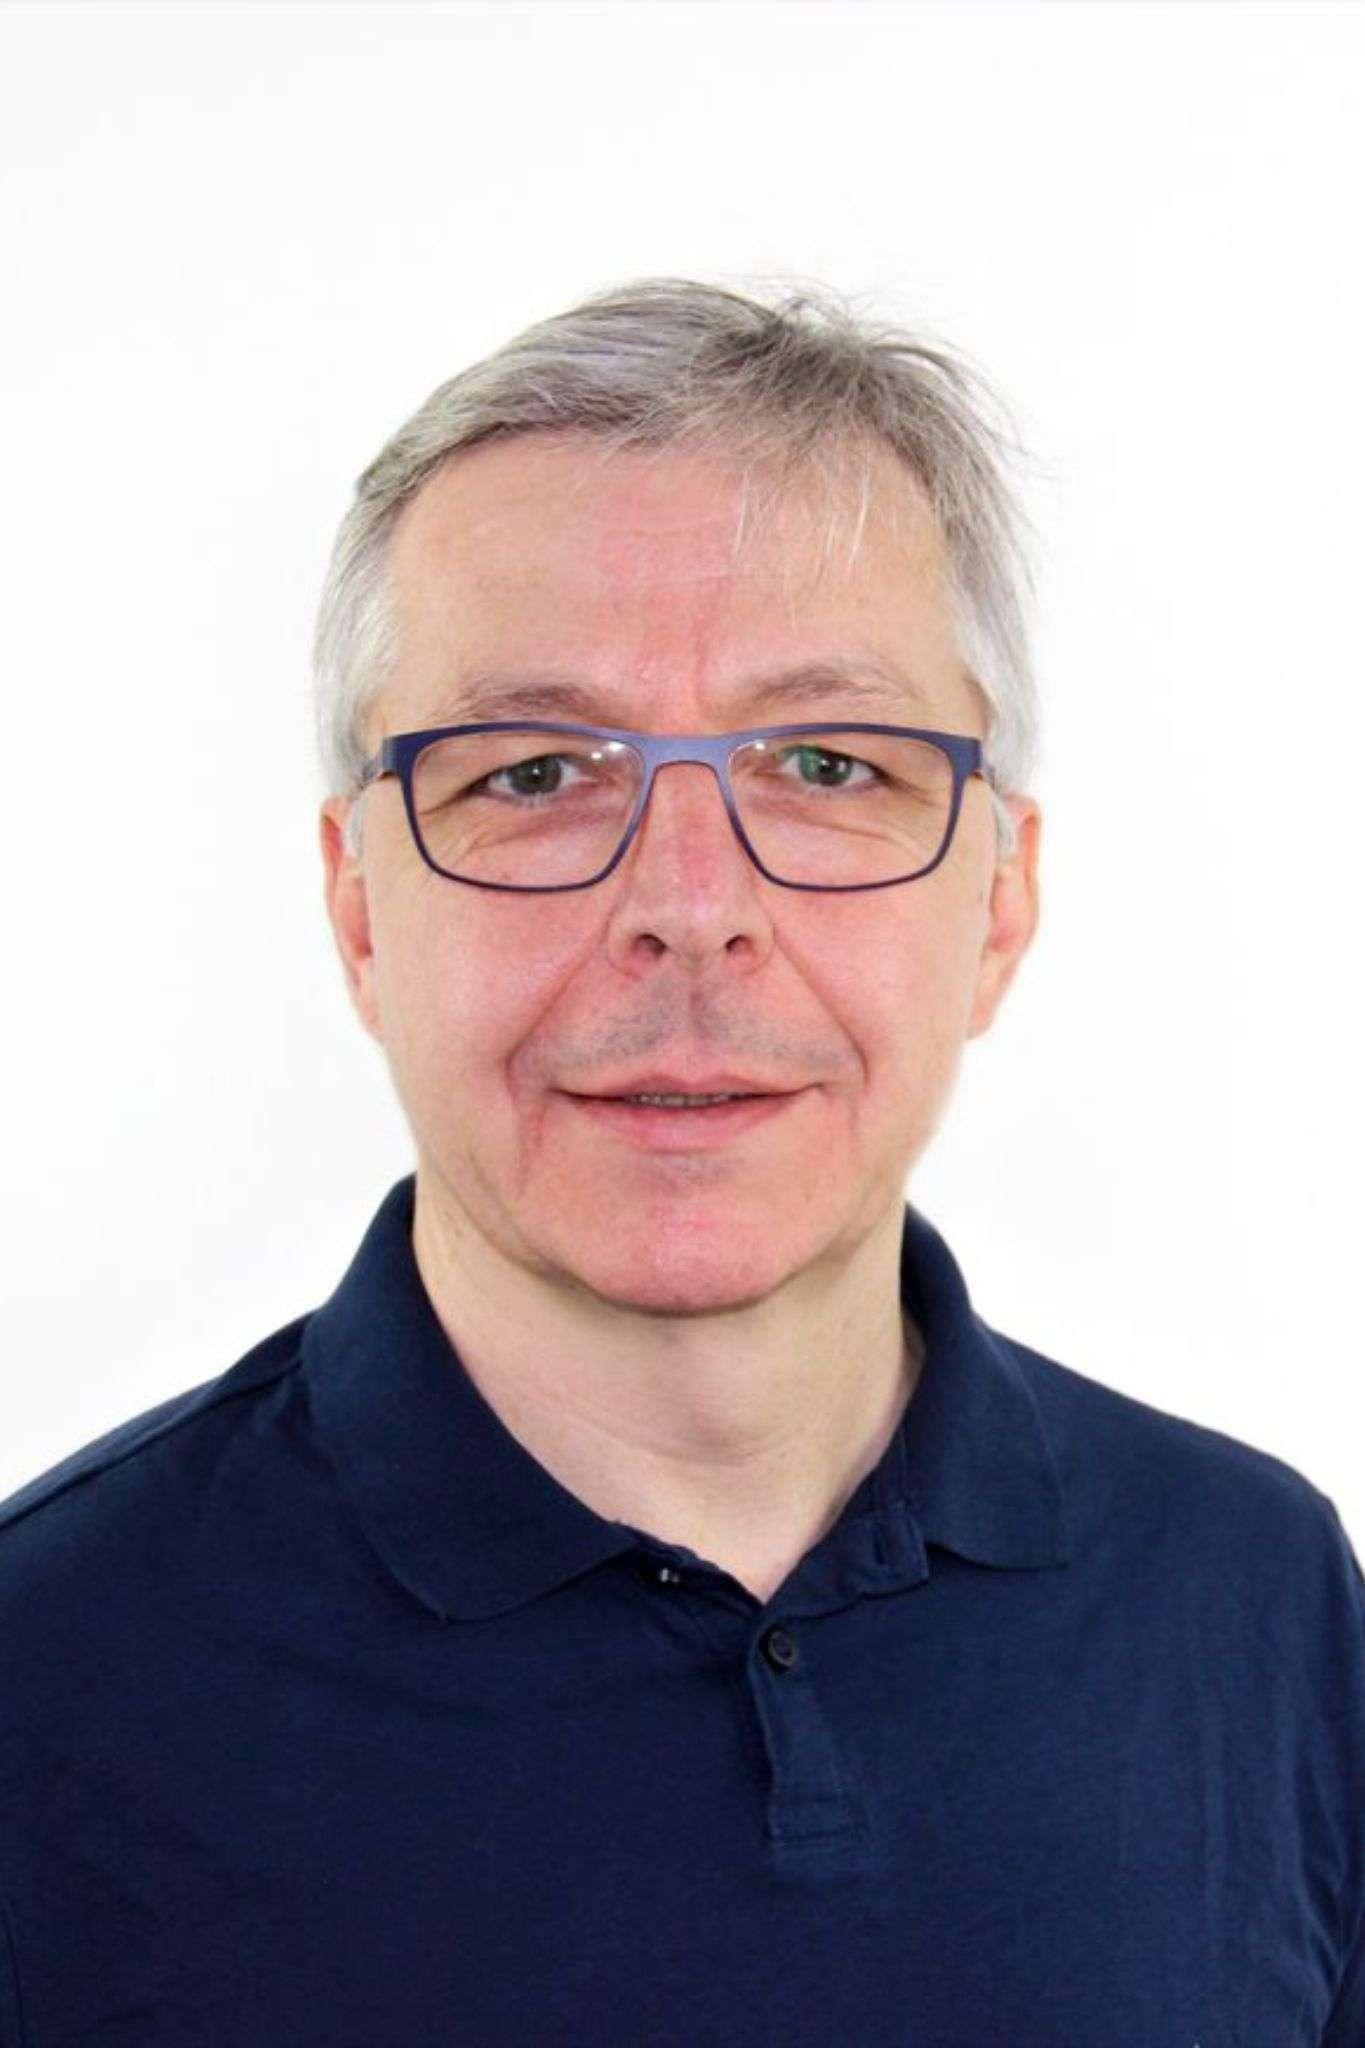 Prof. Dr. med. Johnny Deladoey